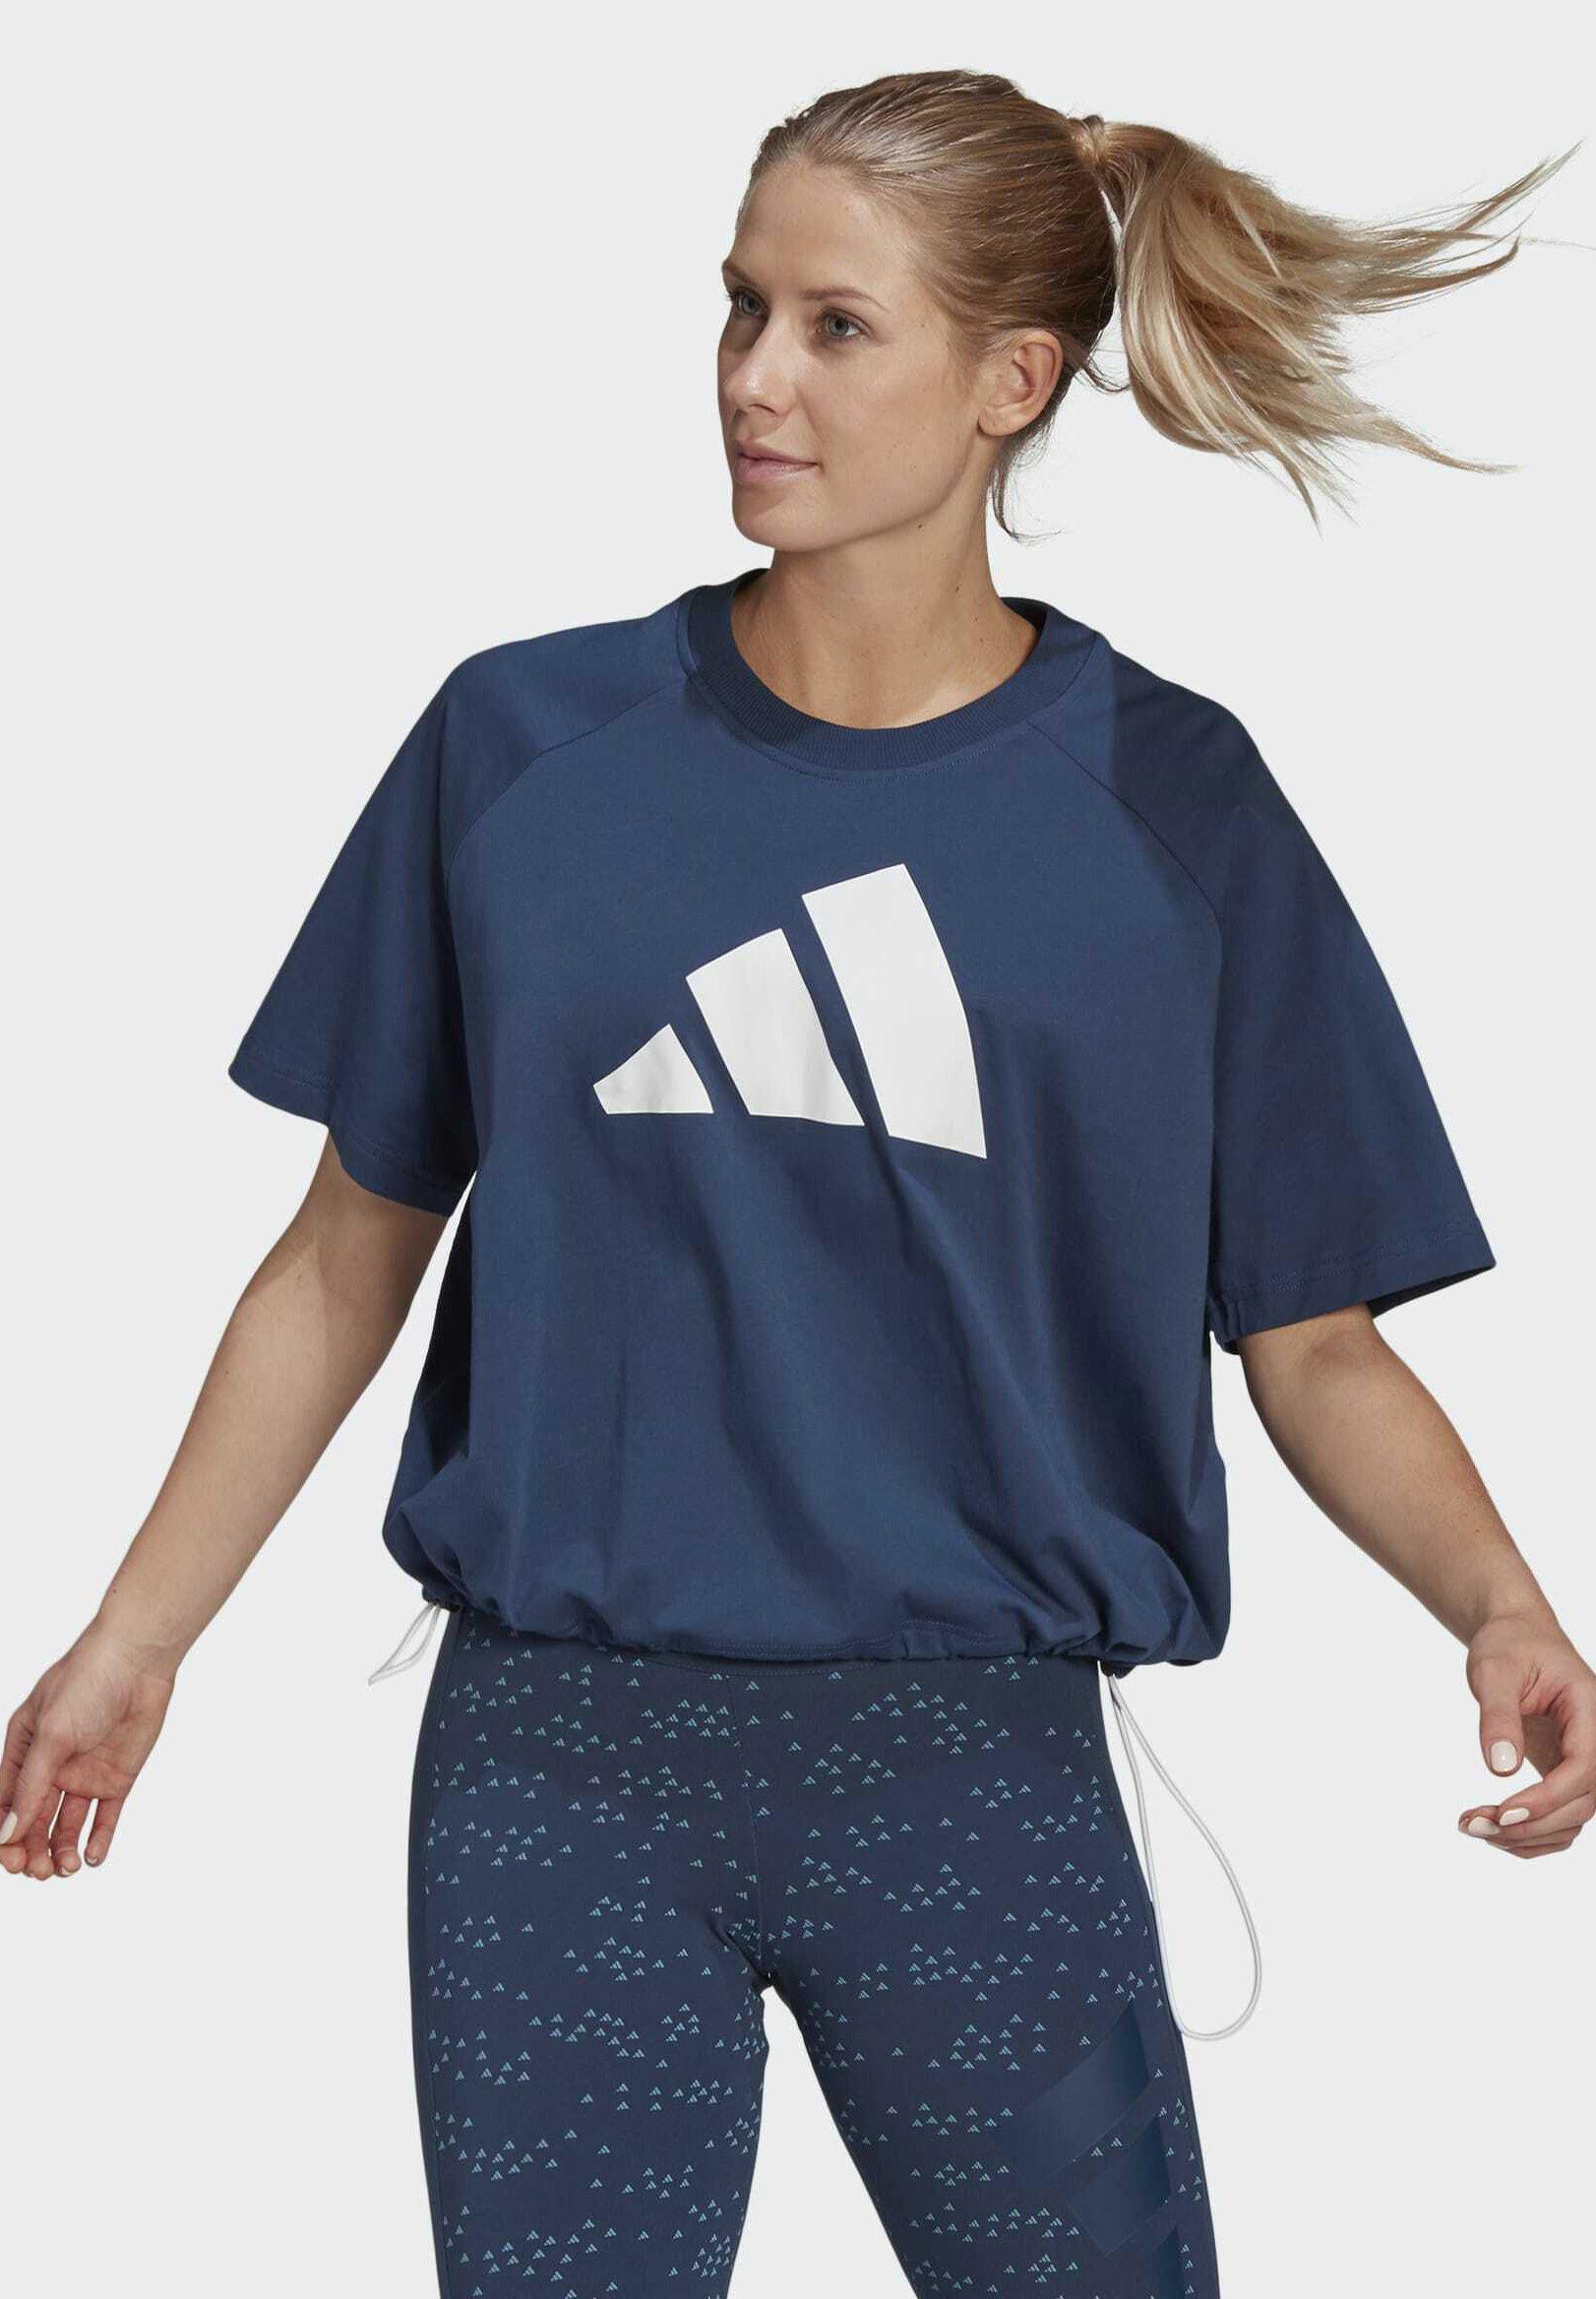 Women ADIDAS SPORTSWEAR ADJUSTABLE BADGE OF SPORT T-SHIRT - Print T-shirt